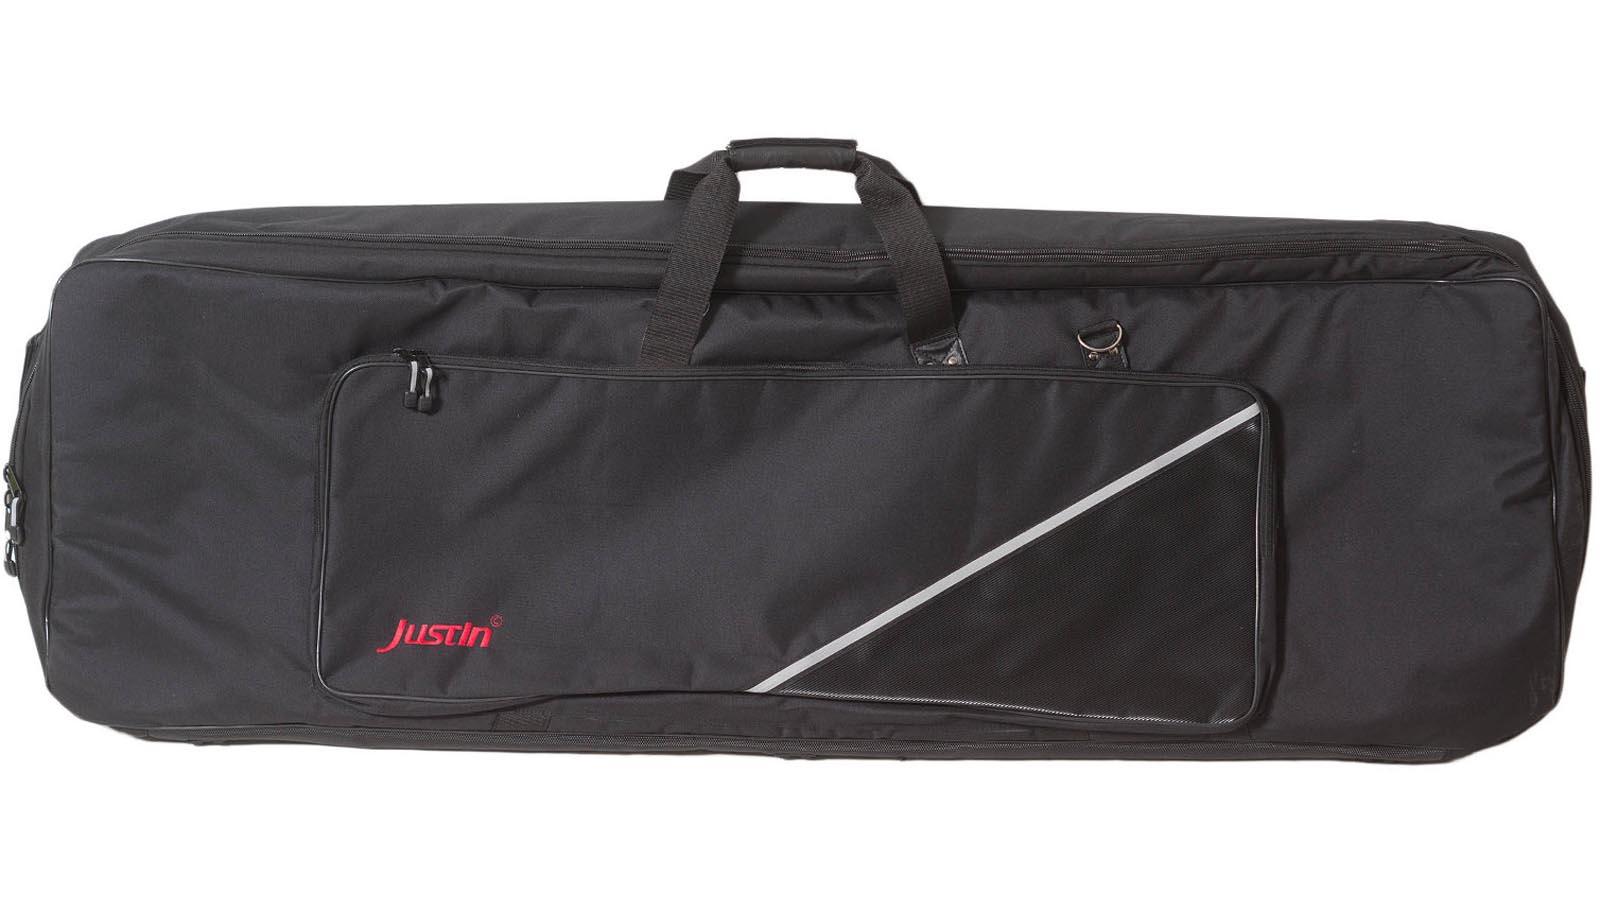 Justin TB 143 Keyboardtasche schwarz 143x43x17cm